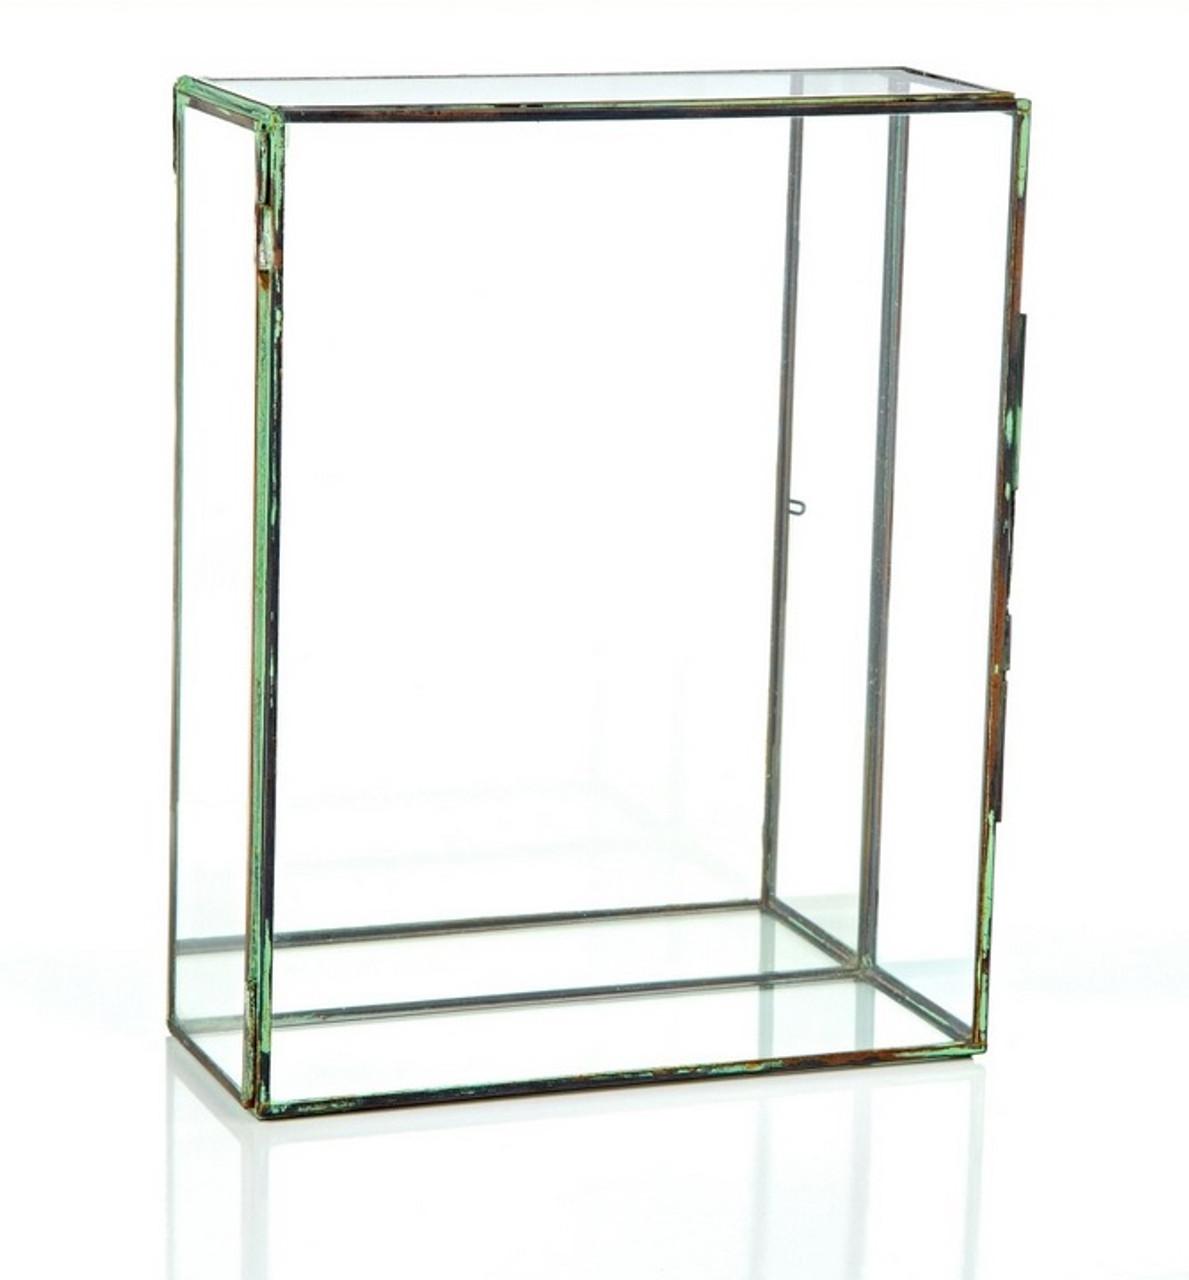 10 Table Top Rectangular Glass Terrarium With Mirror And Hinged Door 31517824